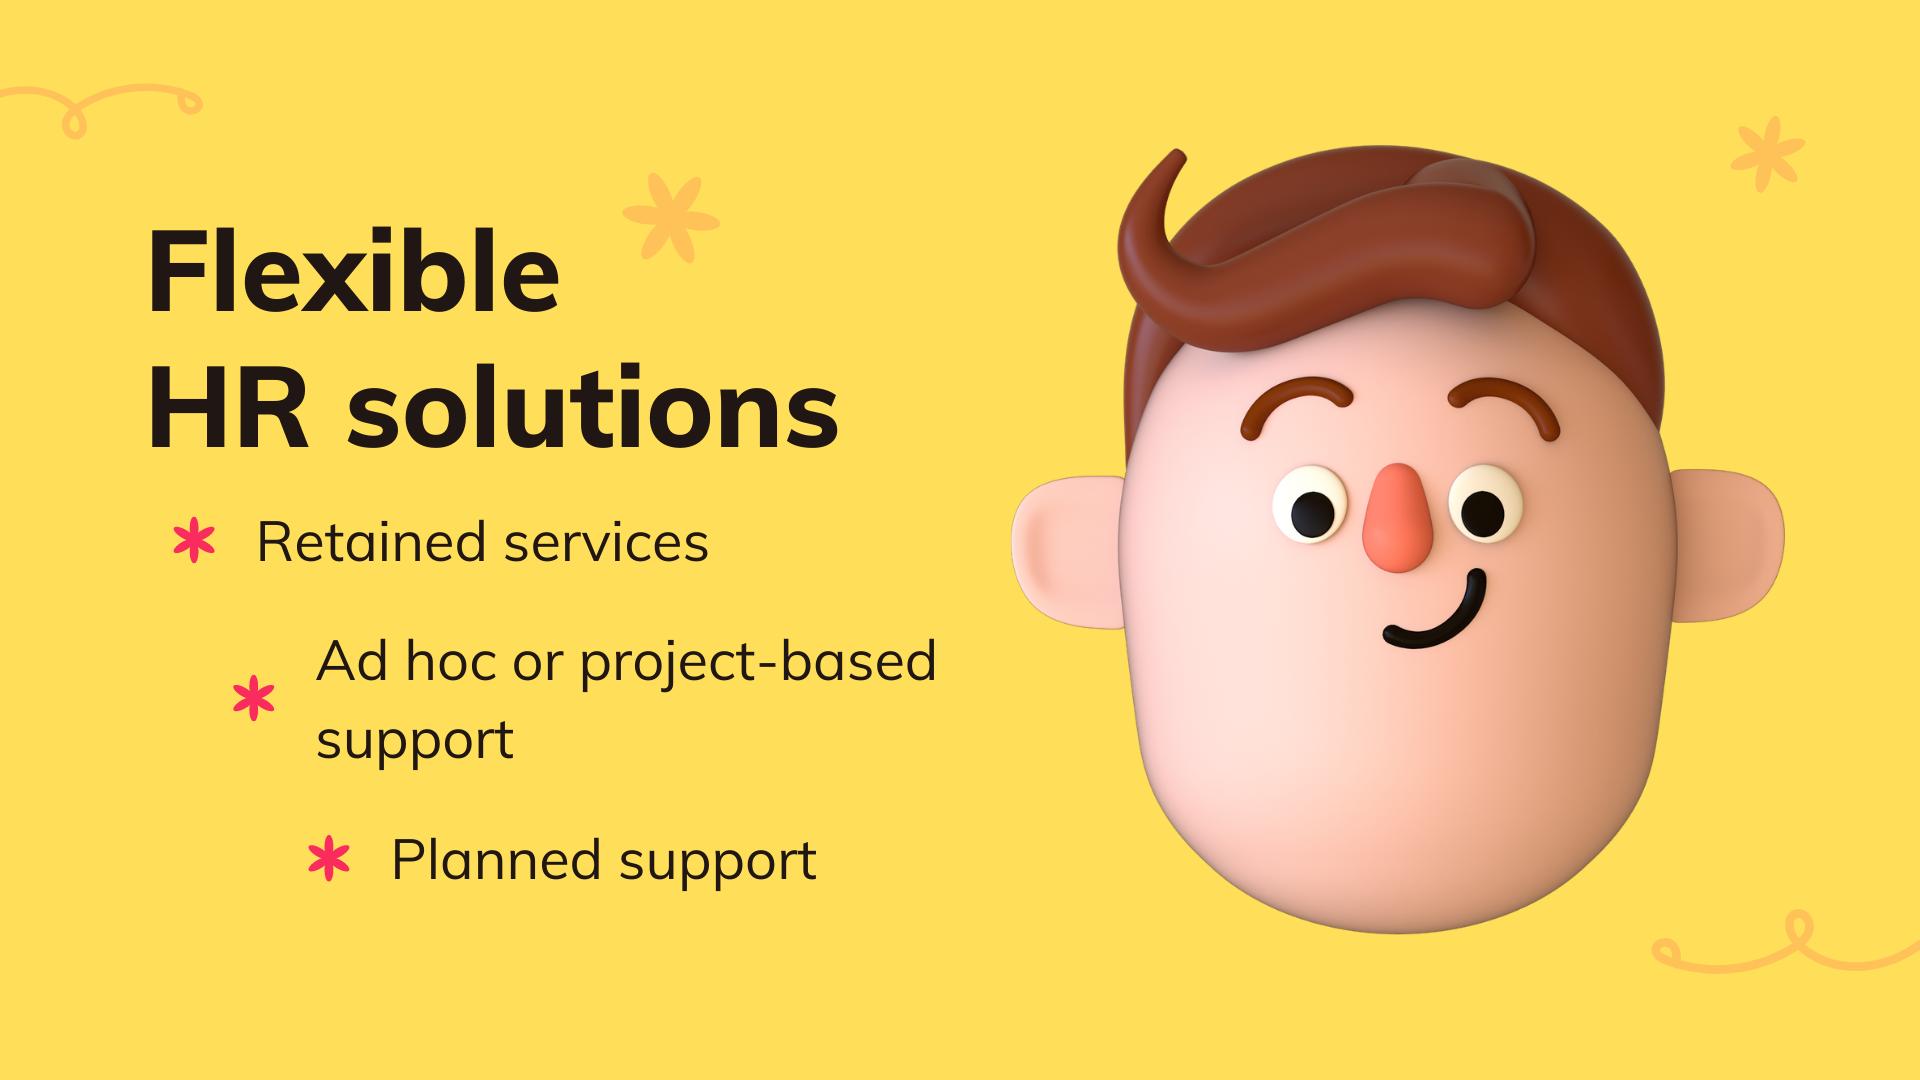 Flexible HR solutions